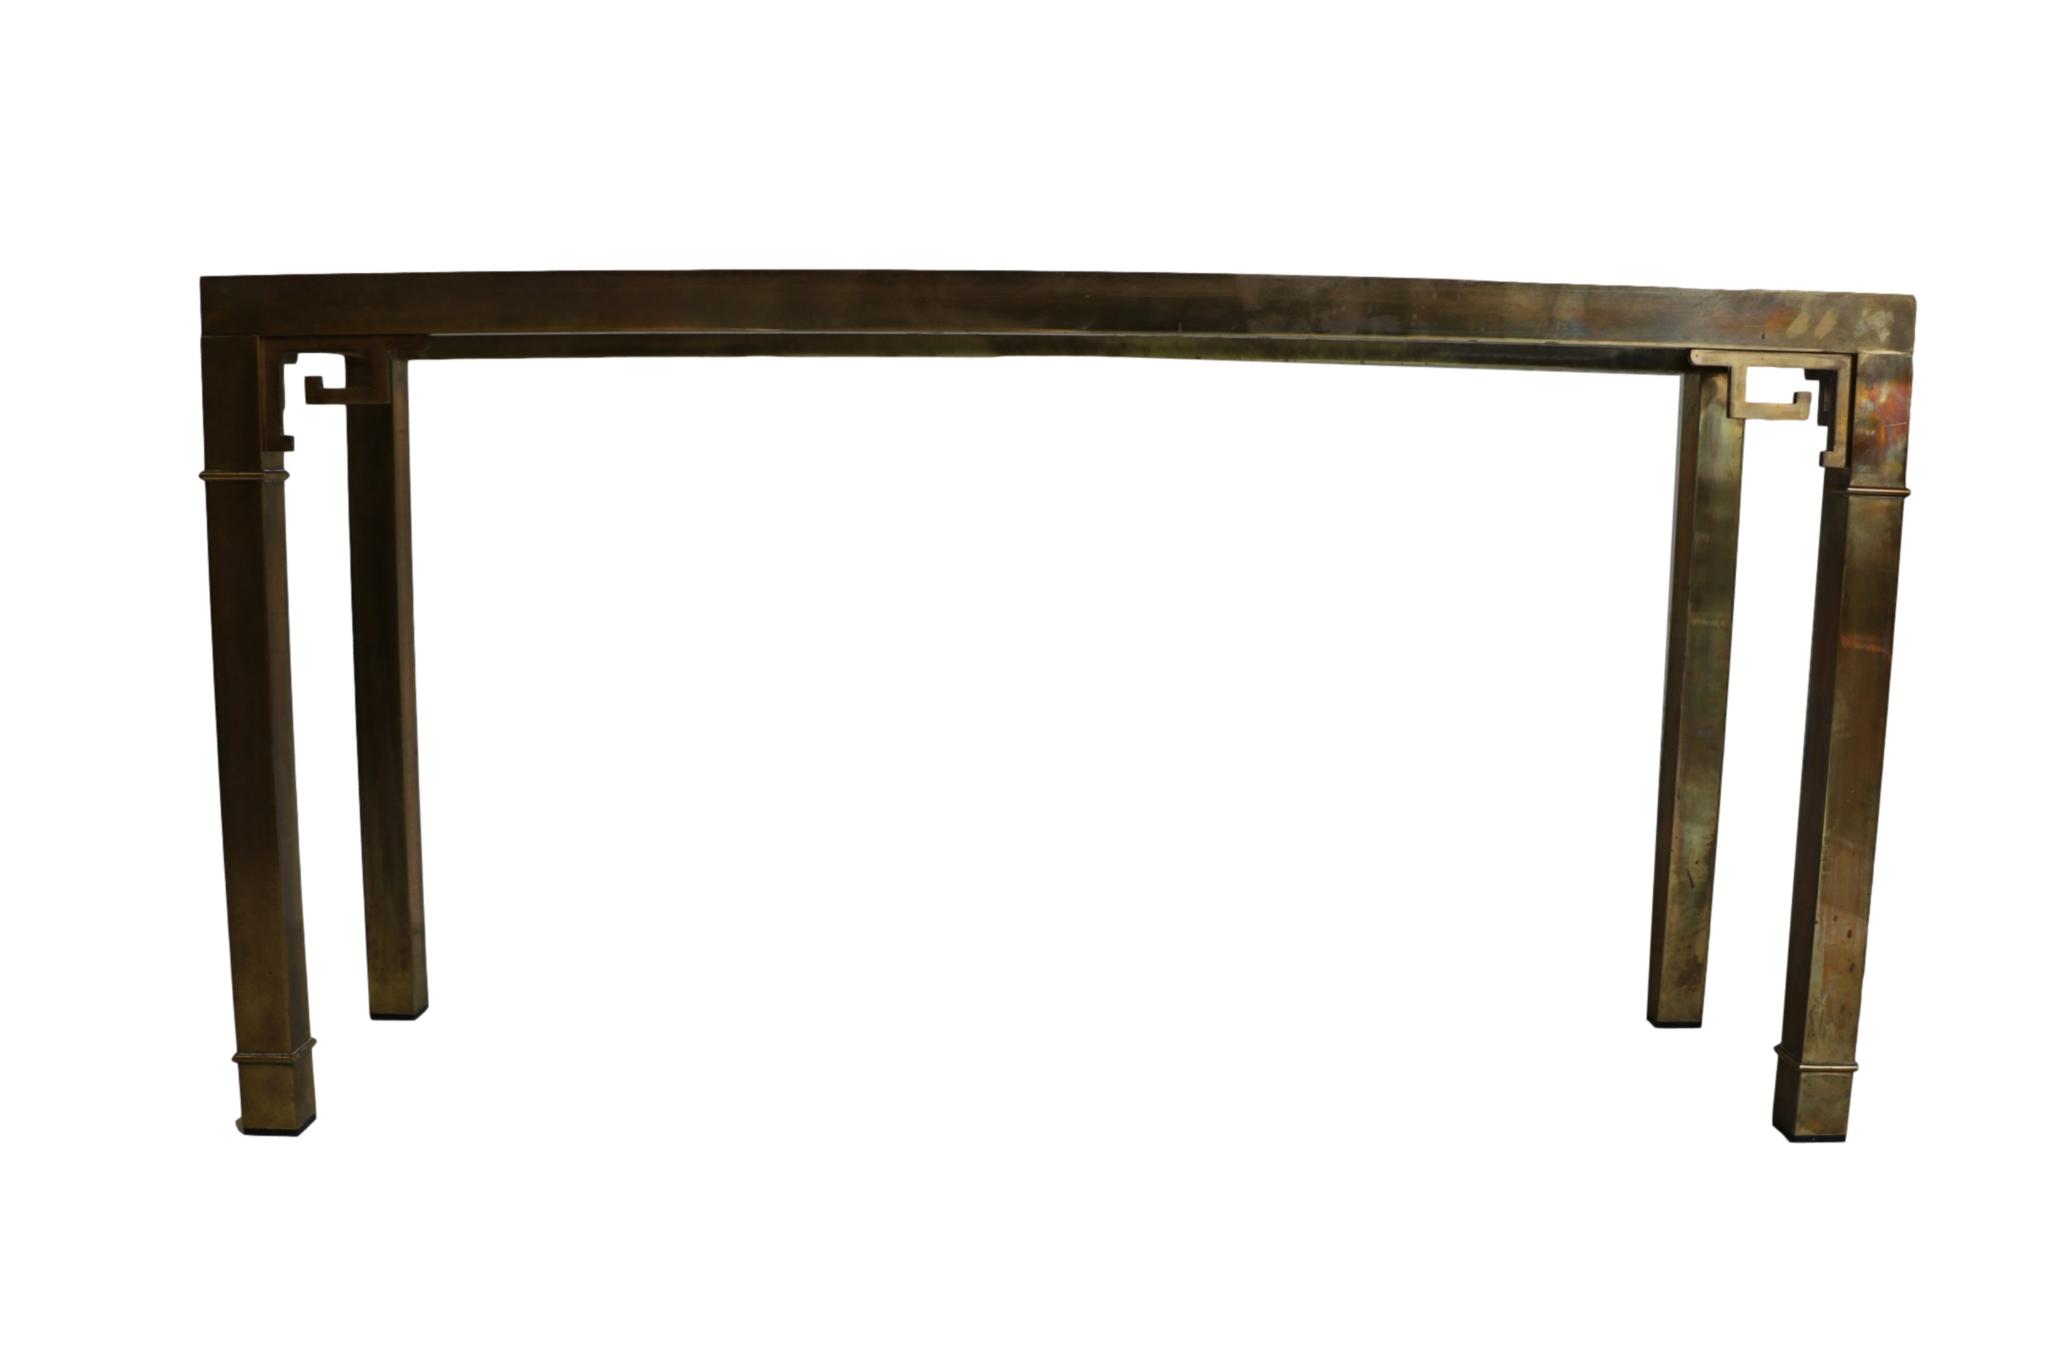 Mastercraft Furniture Sofa Refil Sofa : MCMF 08045L from forexrefiller.com size 2048 x 1365 png 450kB